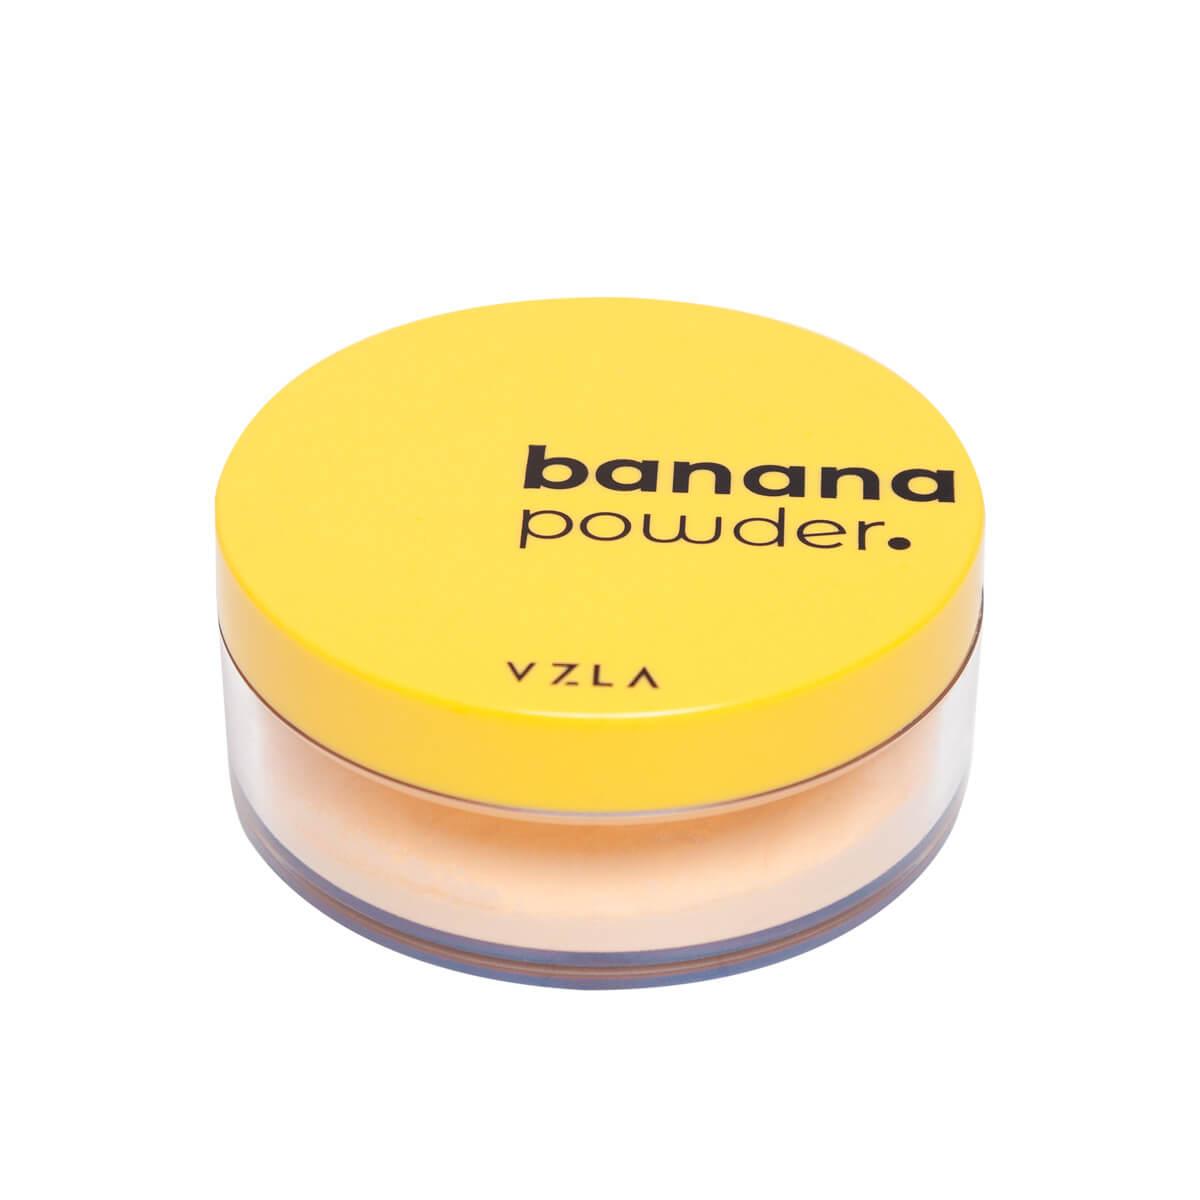 Pó Vegano Vizzela Banana Powder Ultrafino Aveludado Color Adapt